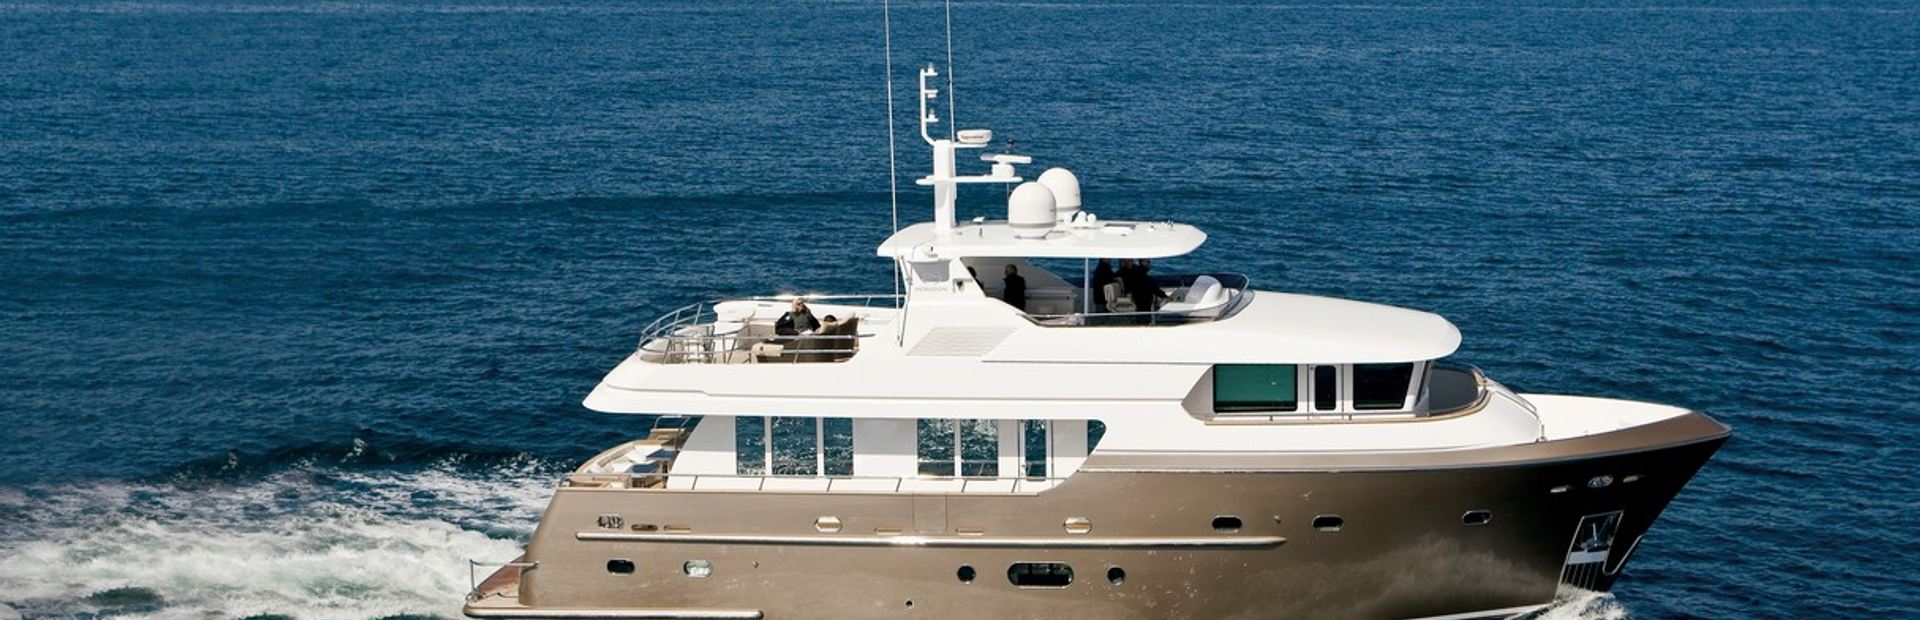 EP77 Yacht Charter